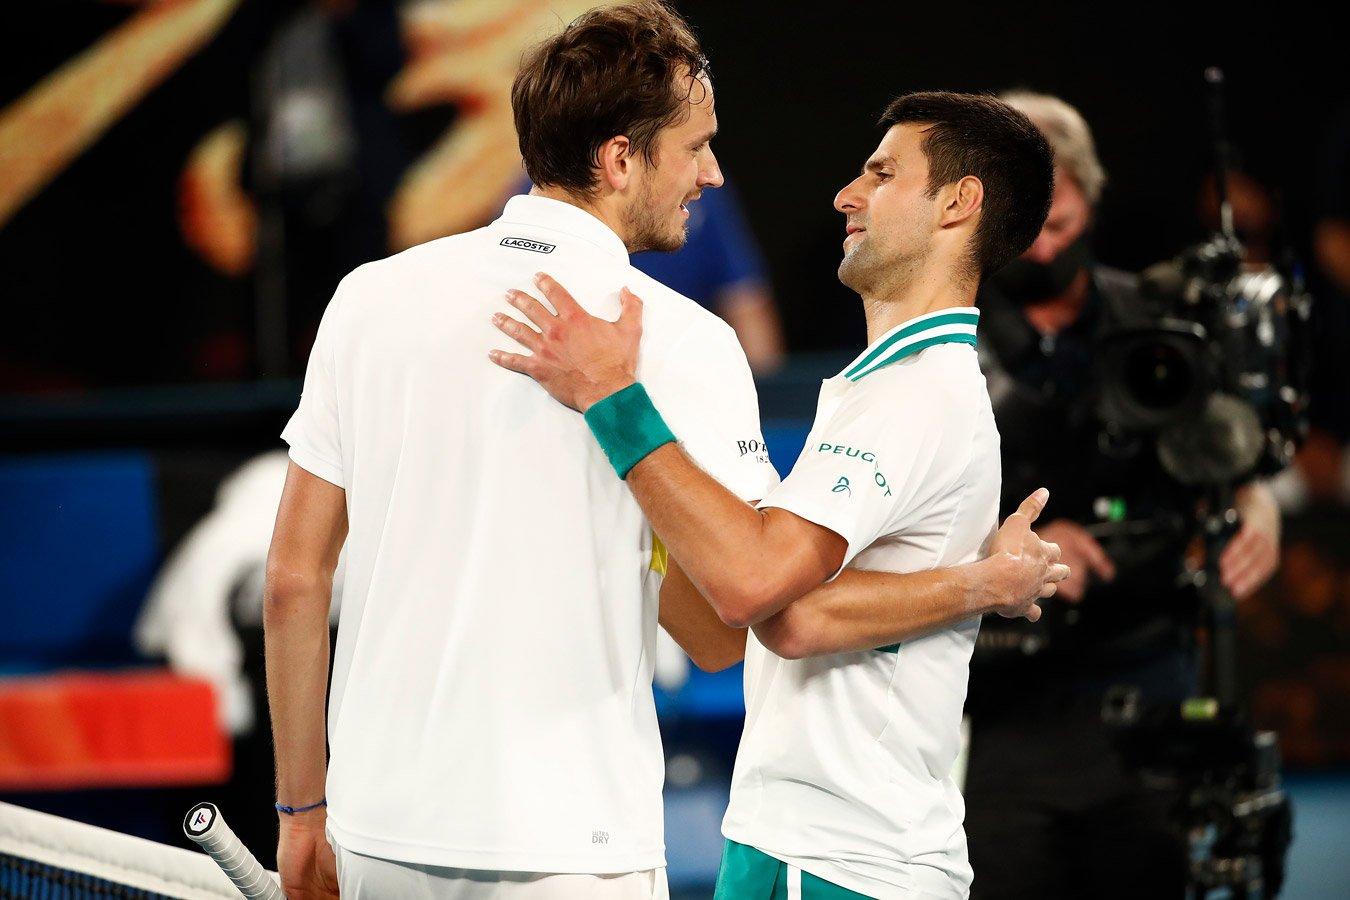 Даниил Медведев в трёх сетах обыграл Новака Джоковича в финале US Open